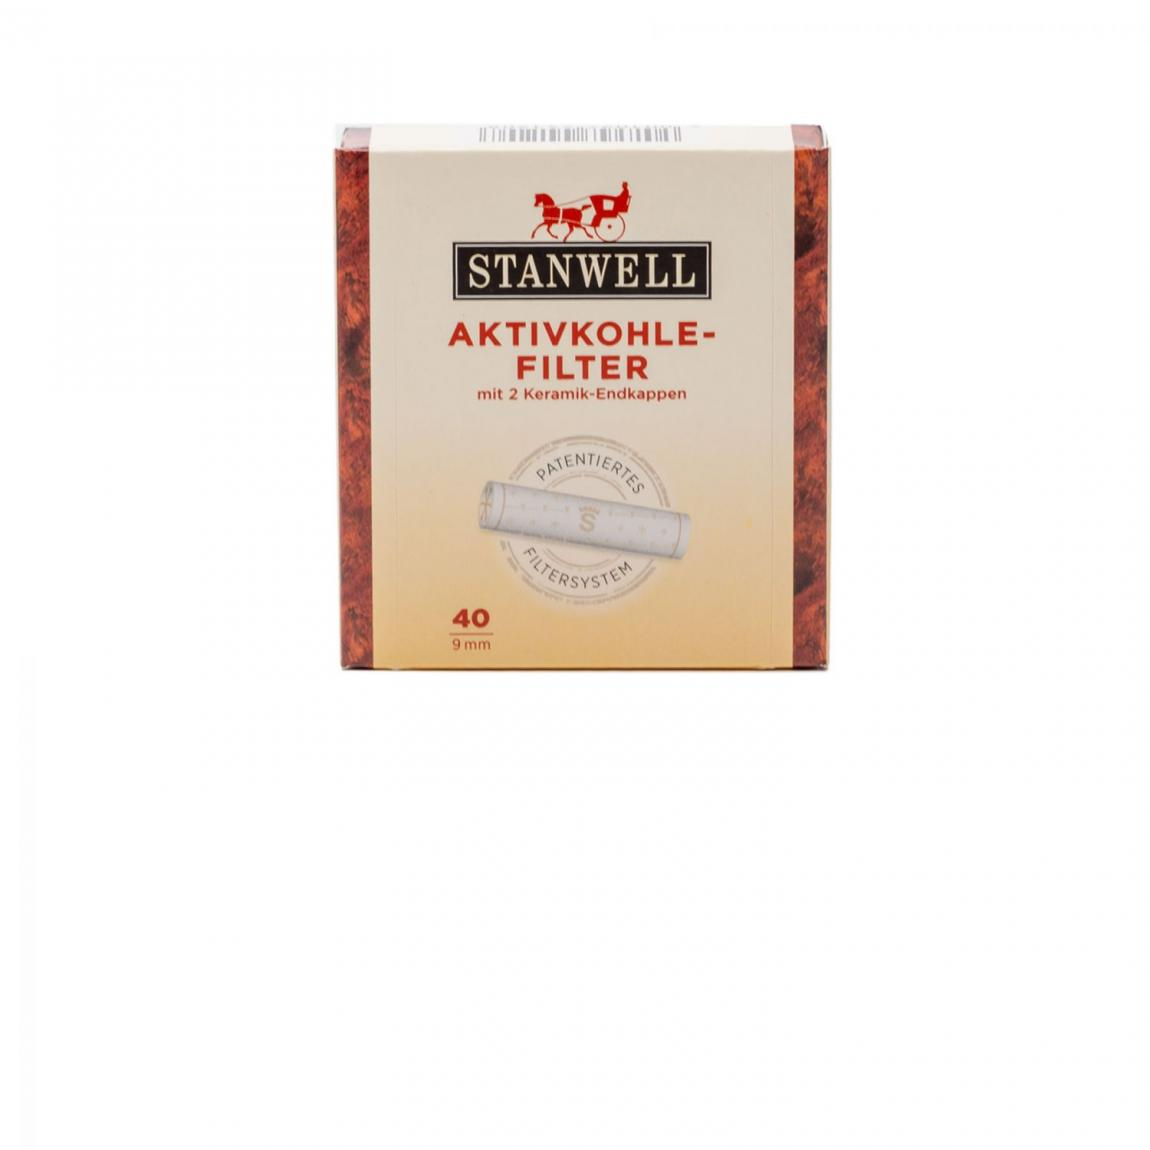 Stanwell Aktivkohle-Filter 9mm 1x40 Stück